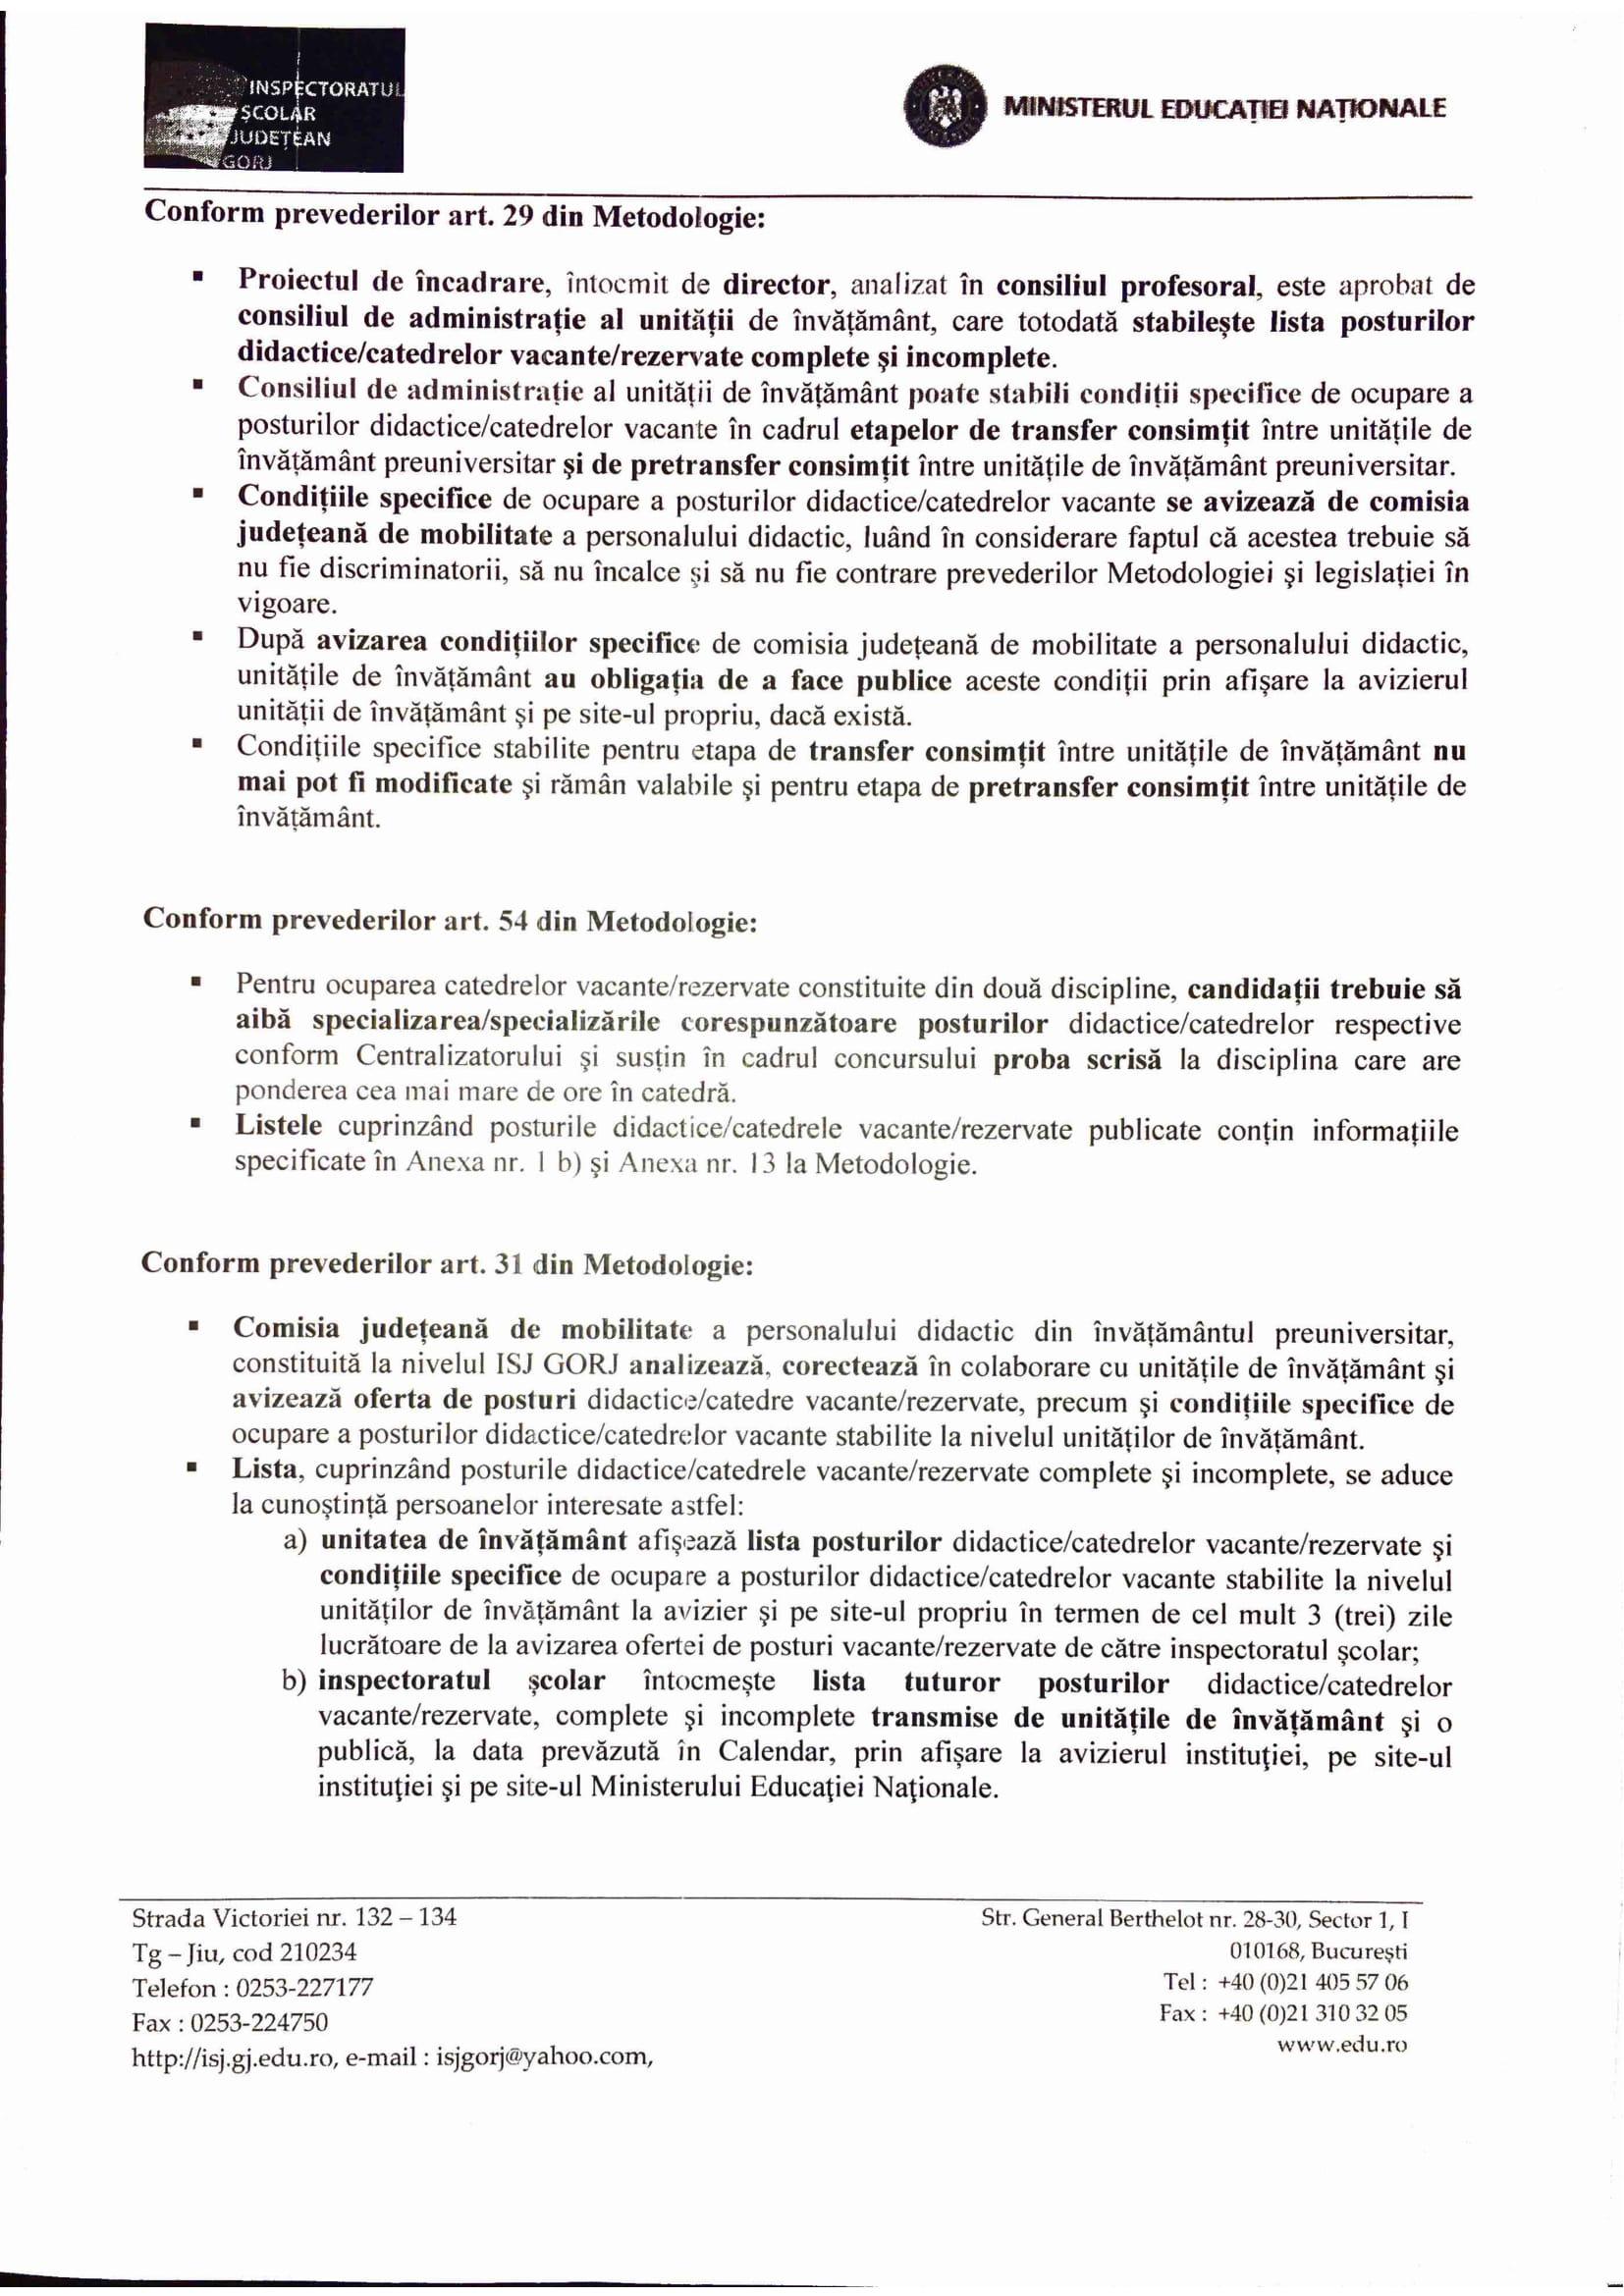 Adresa constituire_încadrare_vacantare-4